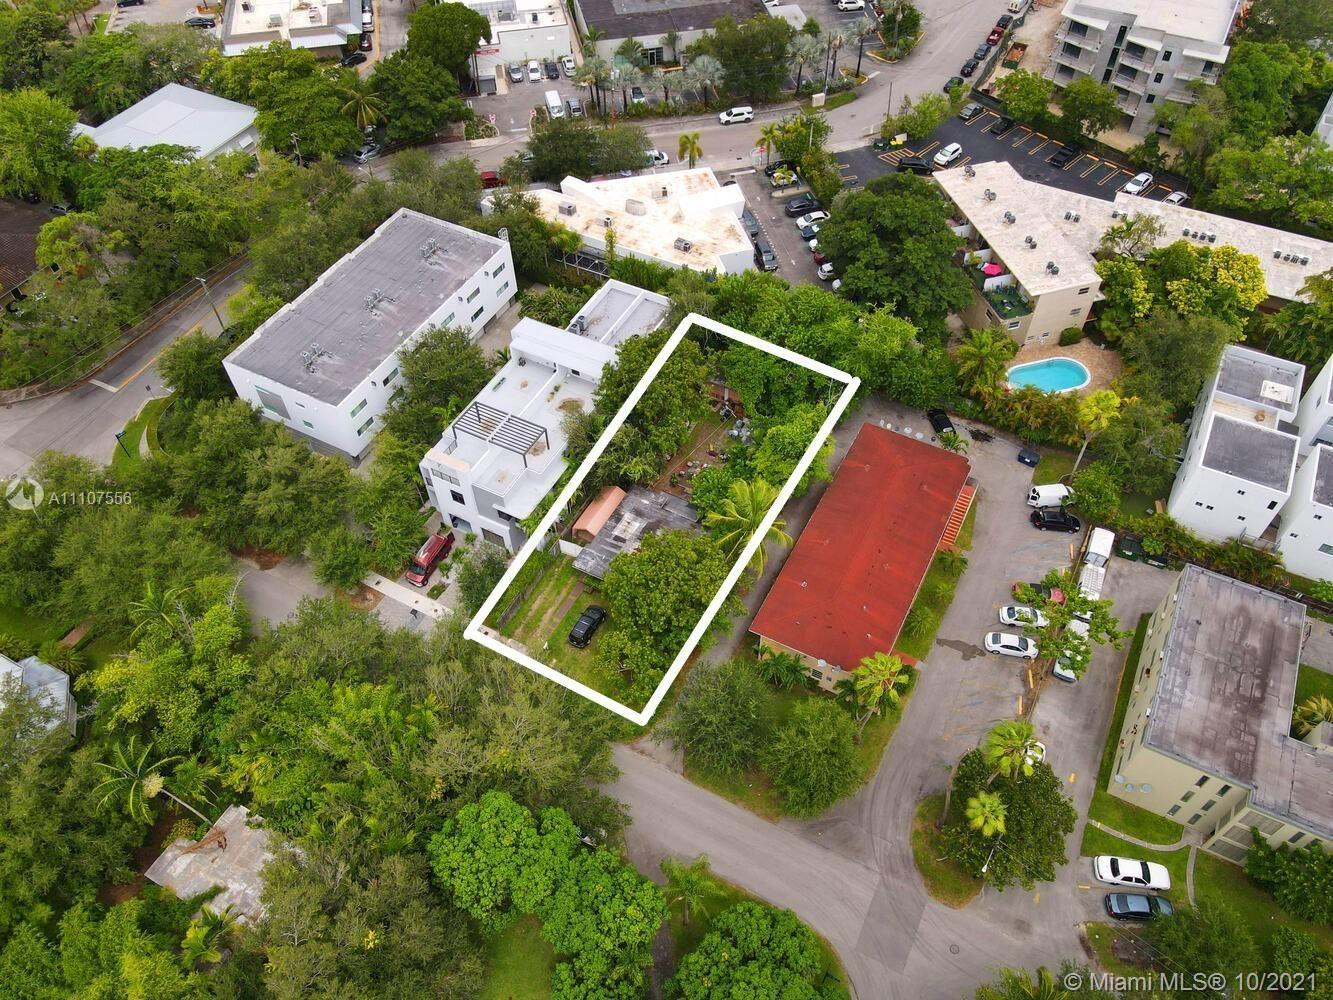 6021 SW 76th St, South Miami, FL 33143 - #: A11107556